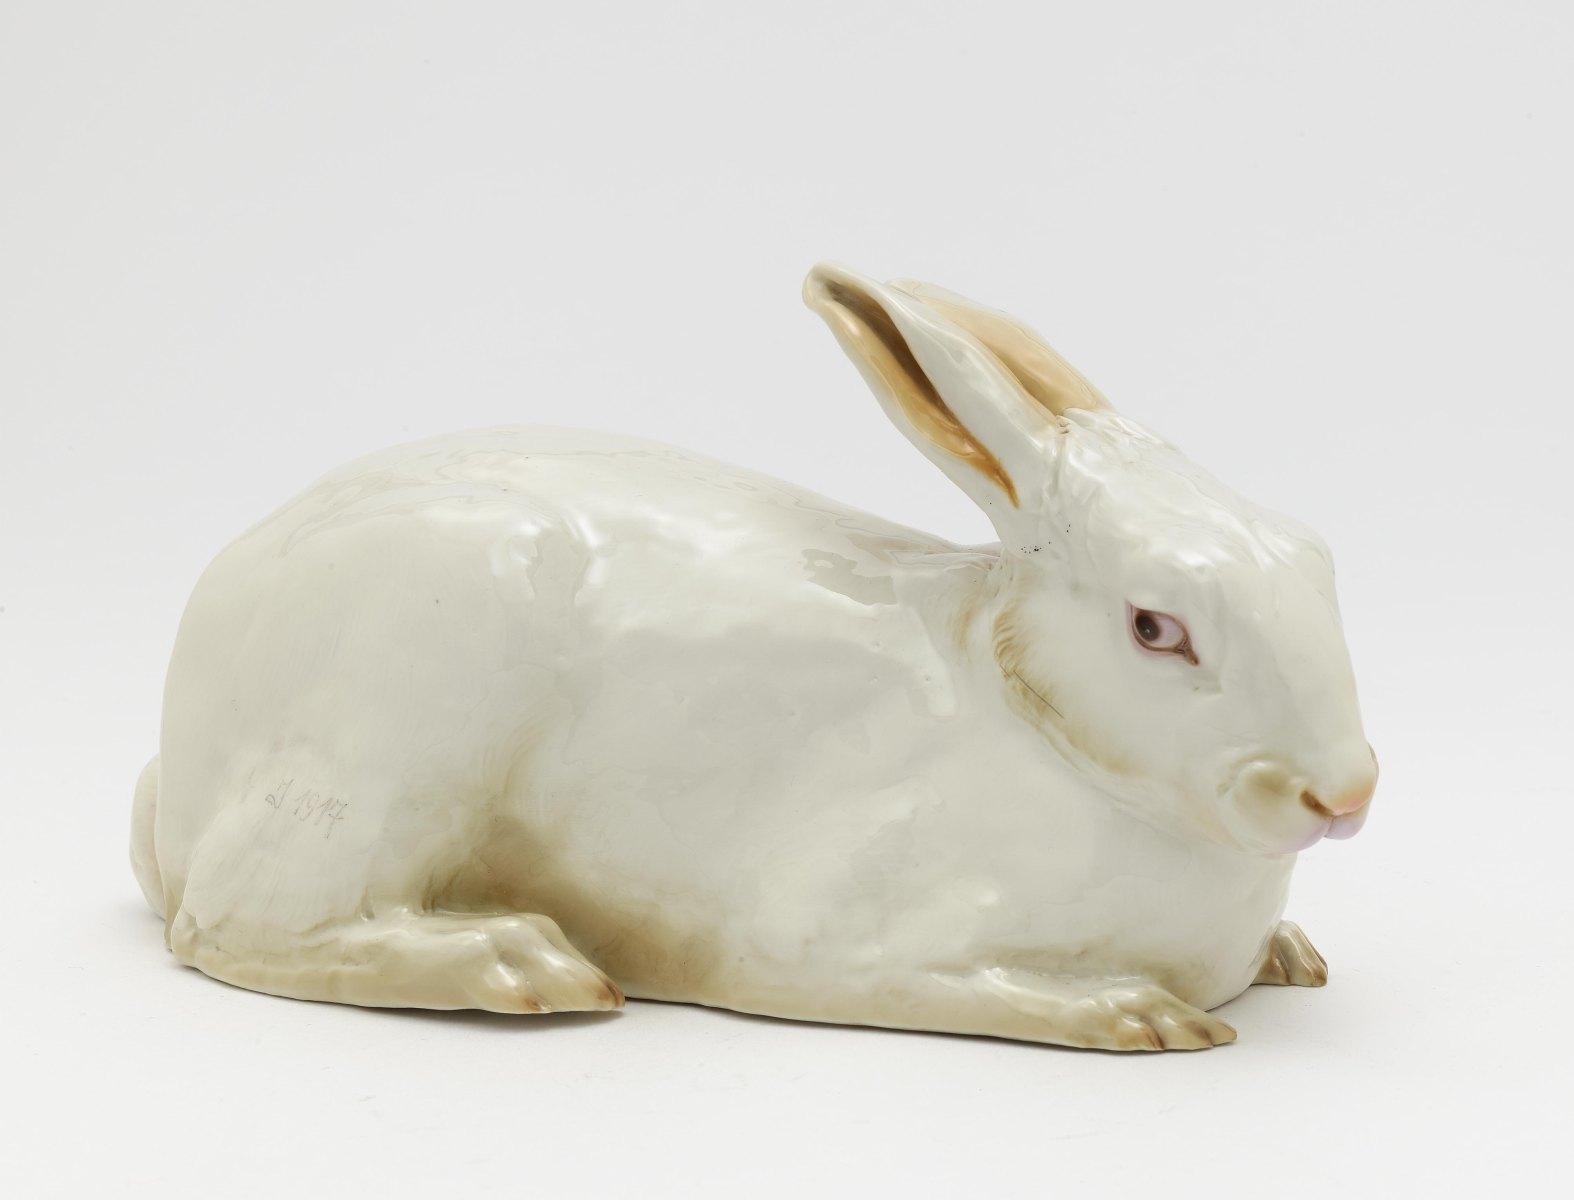 A lying rabbit